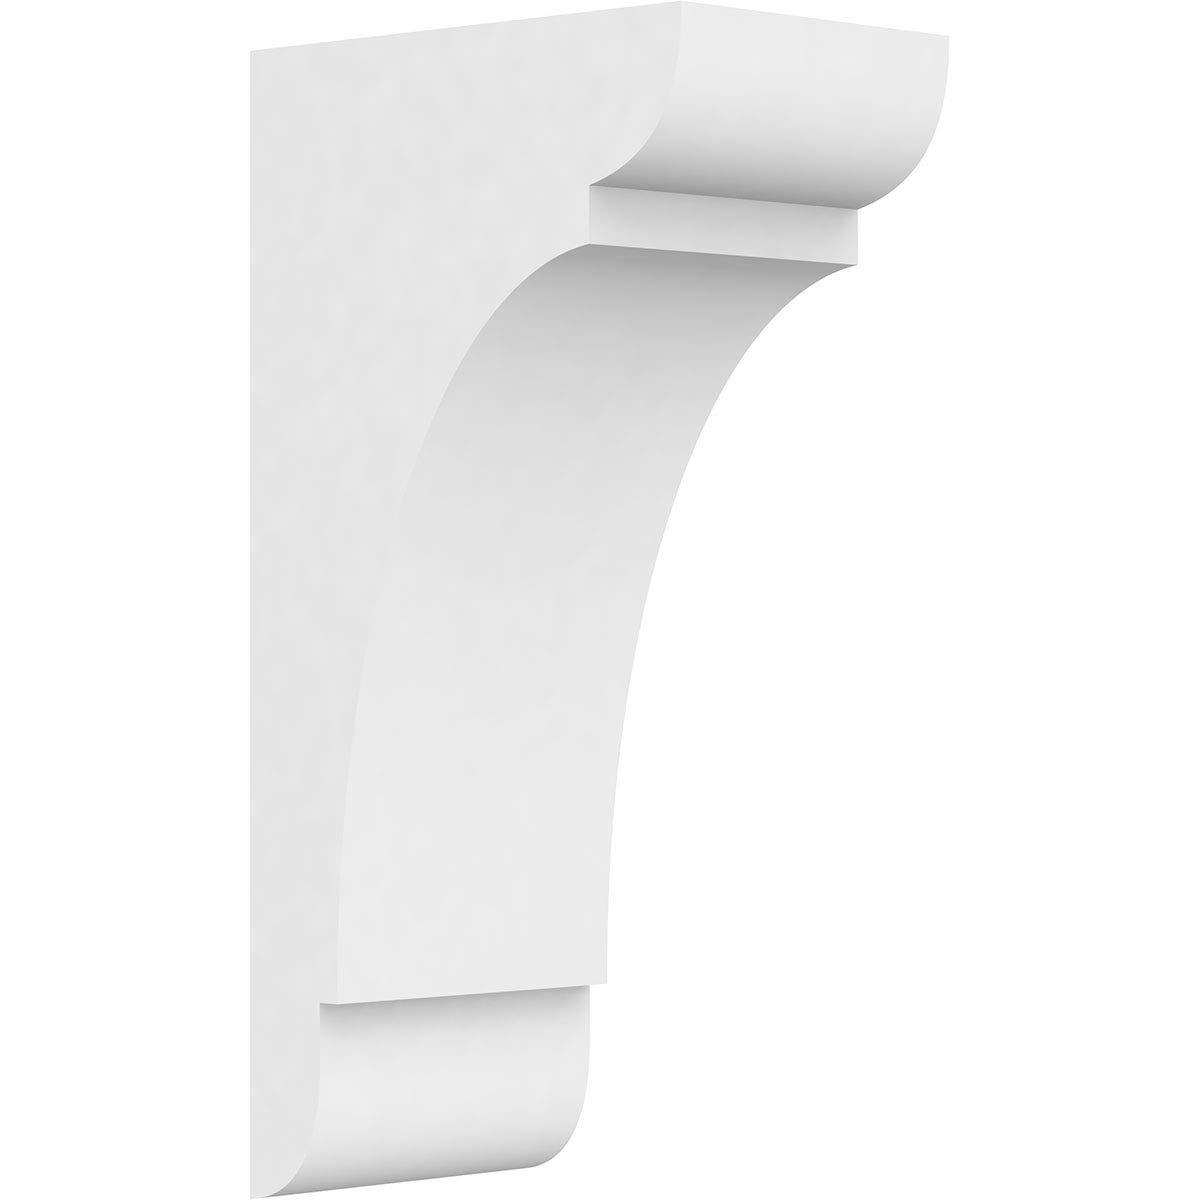 Ekena Millwork CORP03X05X10OLY PVC Corbel 3W x 5D x 10H White